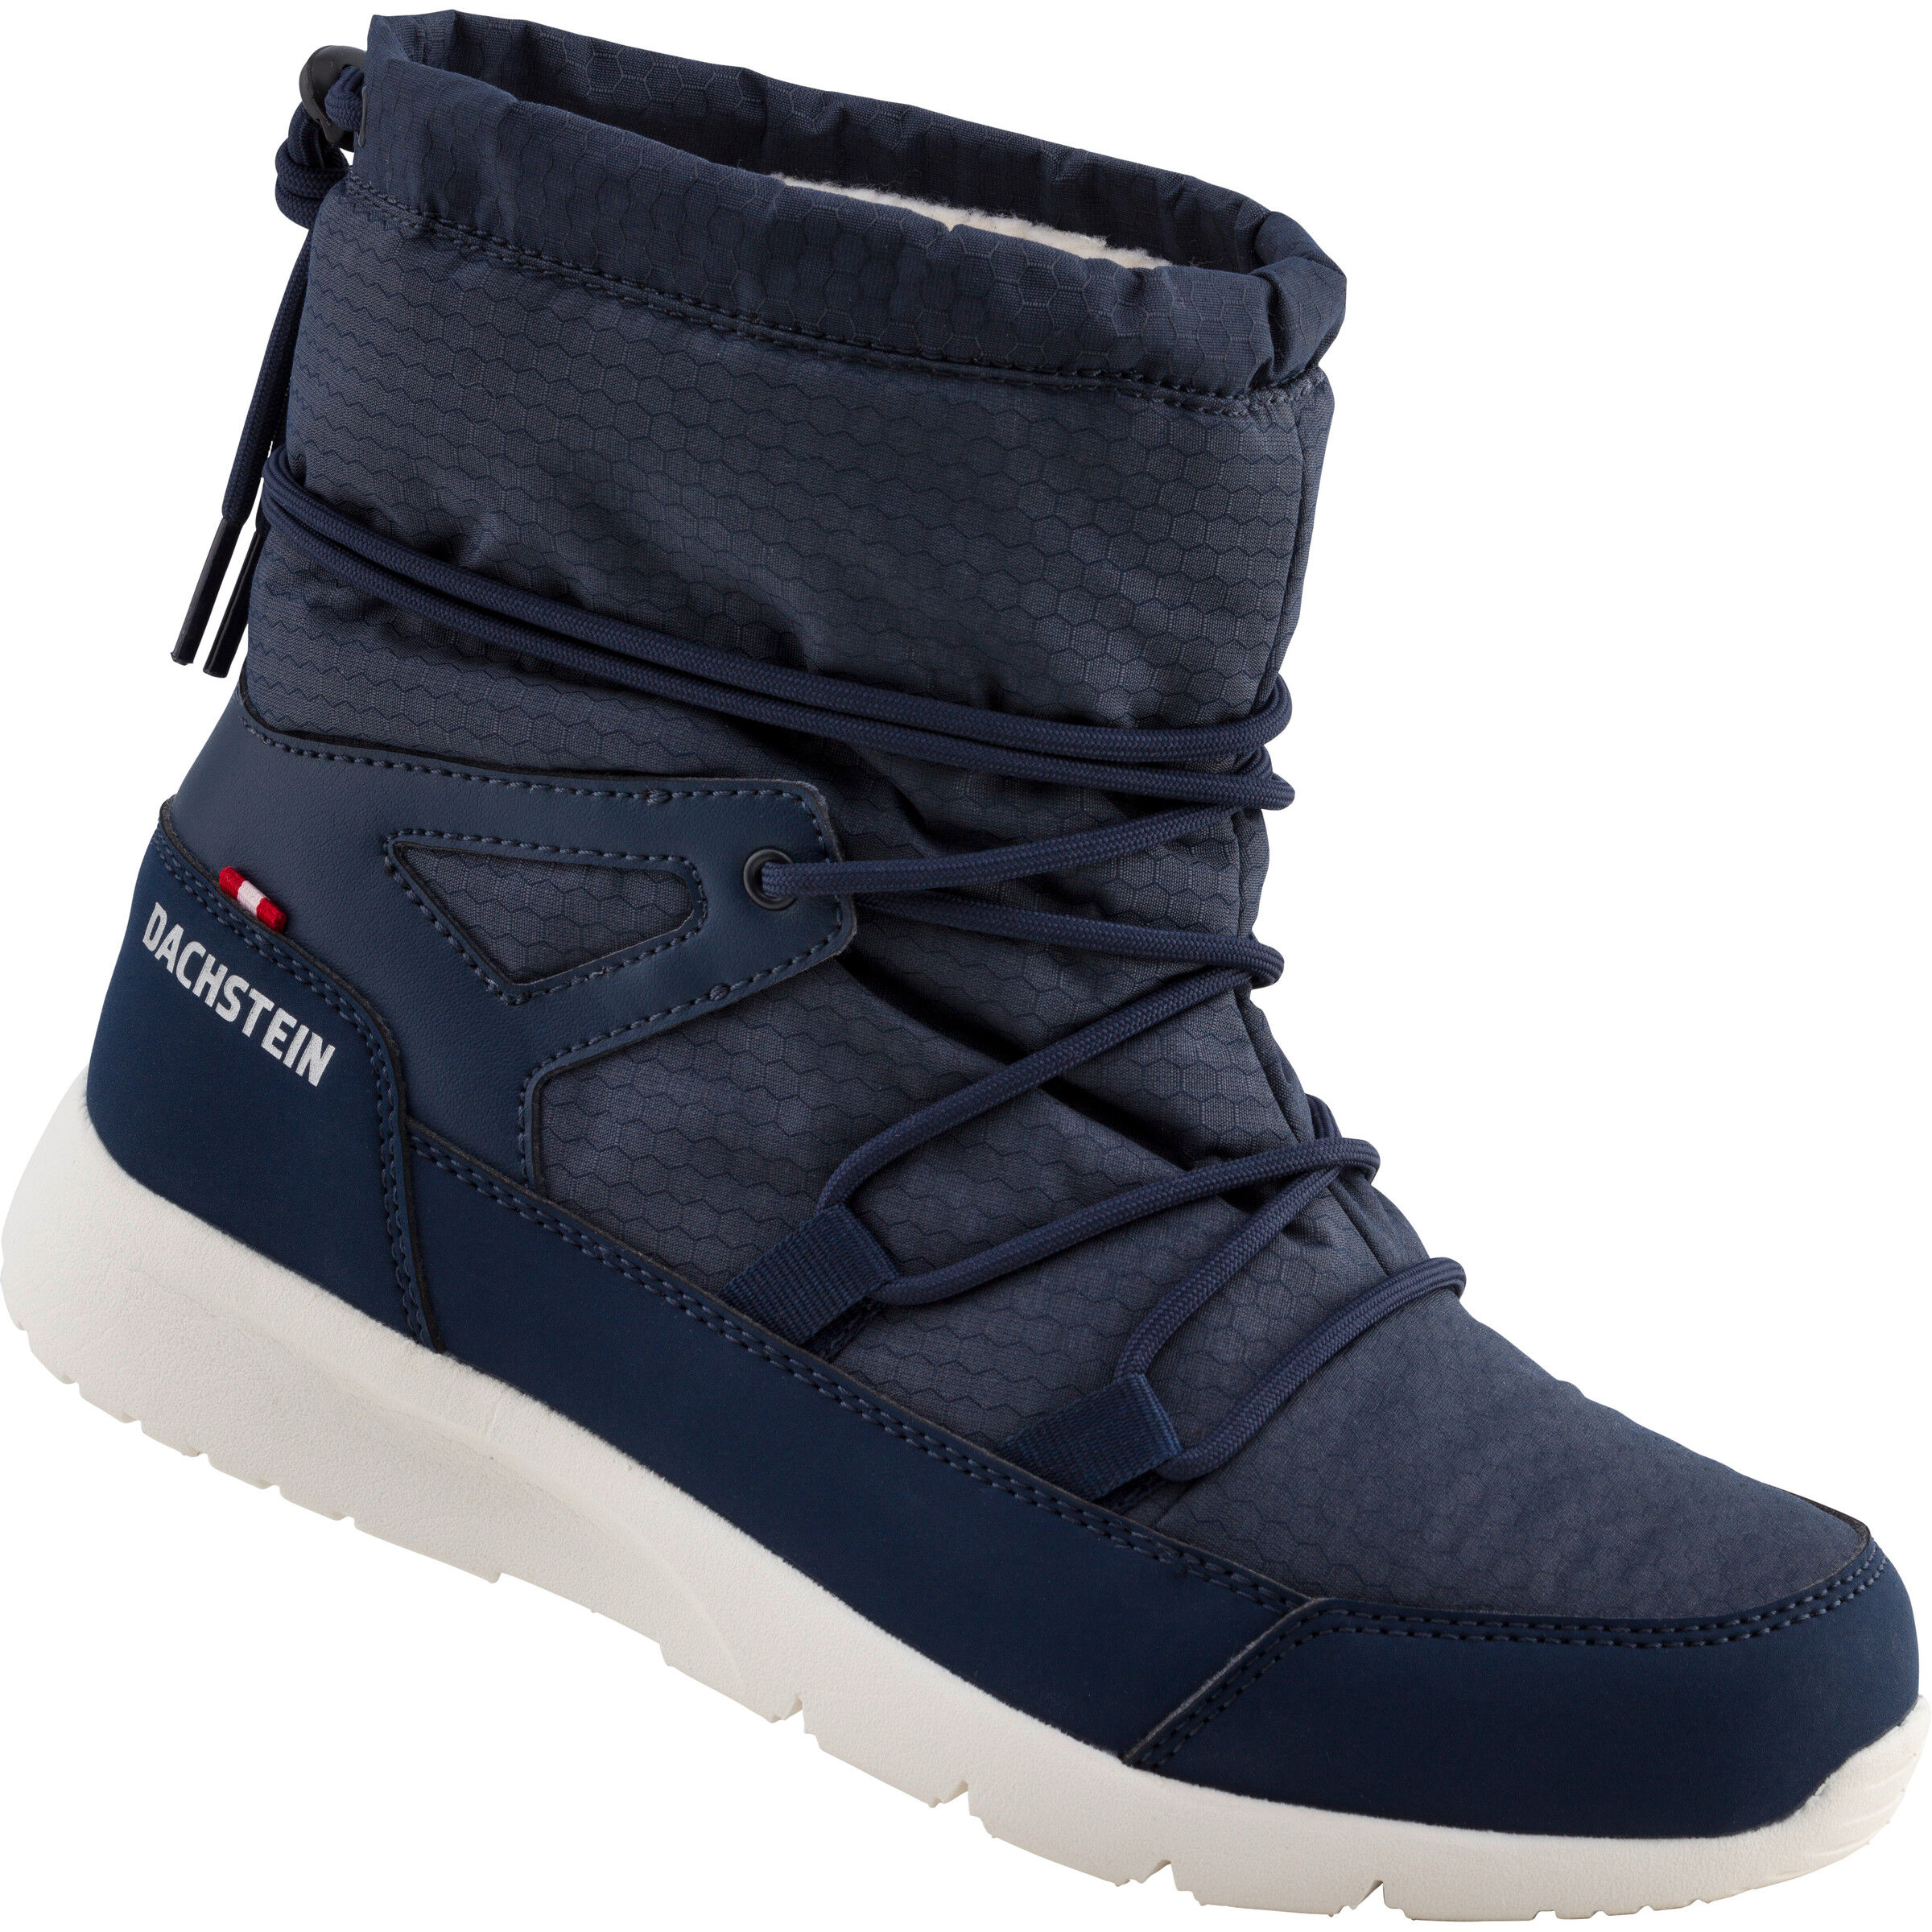 Dachstein Ocean Low Winter Outdoor Shoes Damen navy